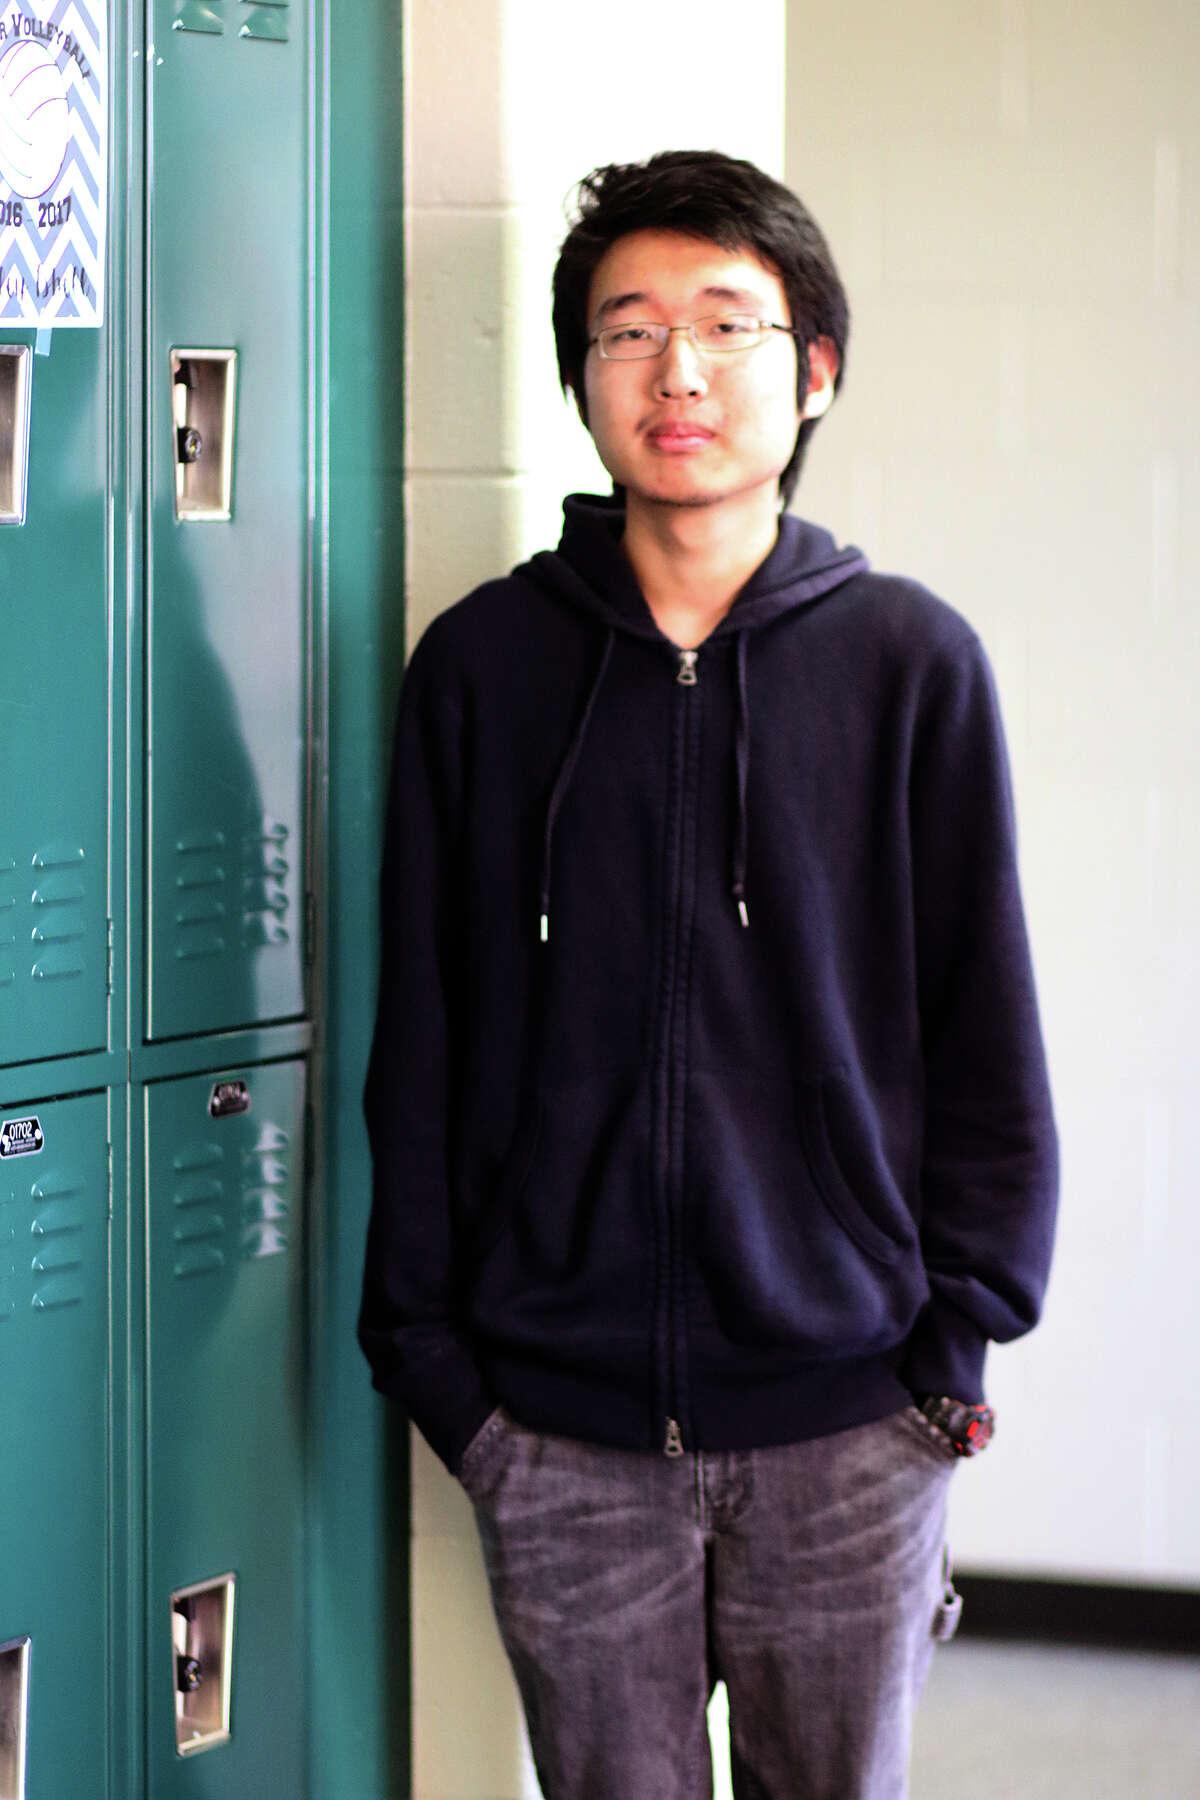 Foster High School senior Zhi Wei Liang is a finalist in the National QuestBridge Scholar Program.